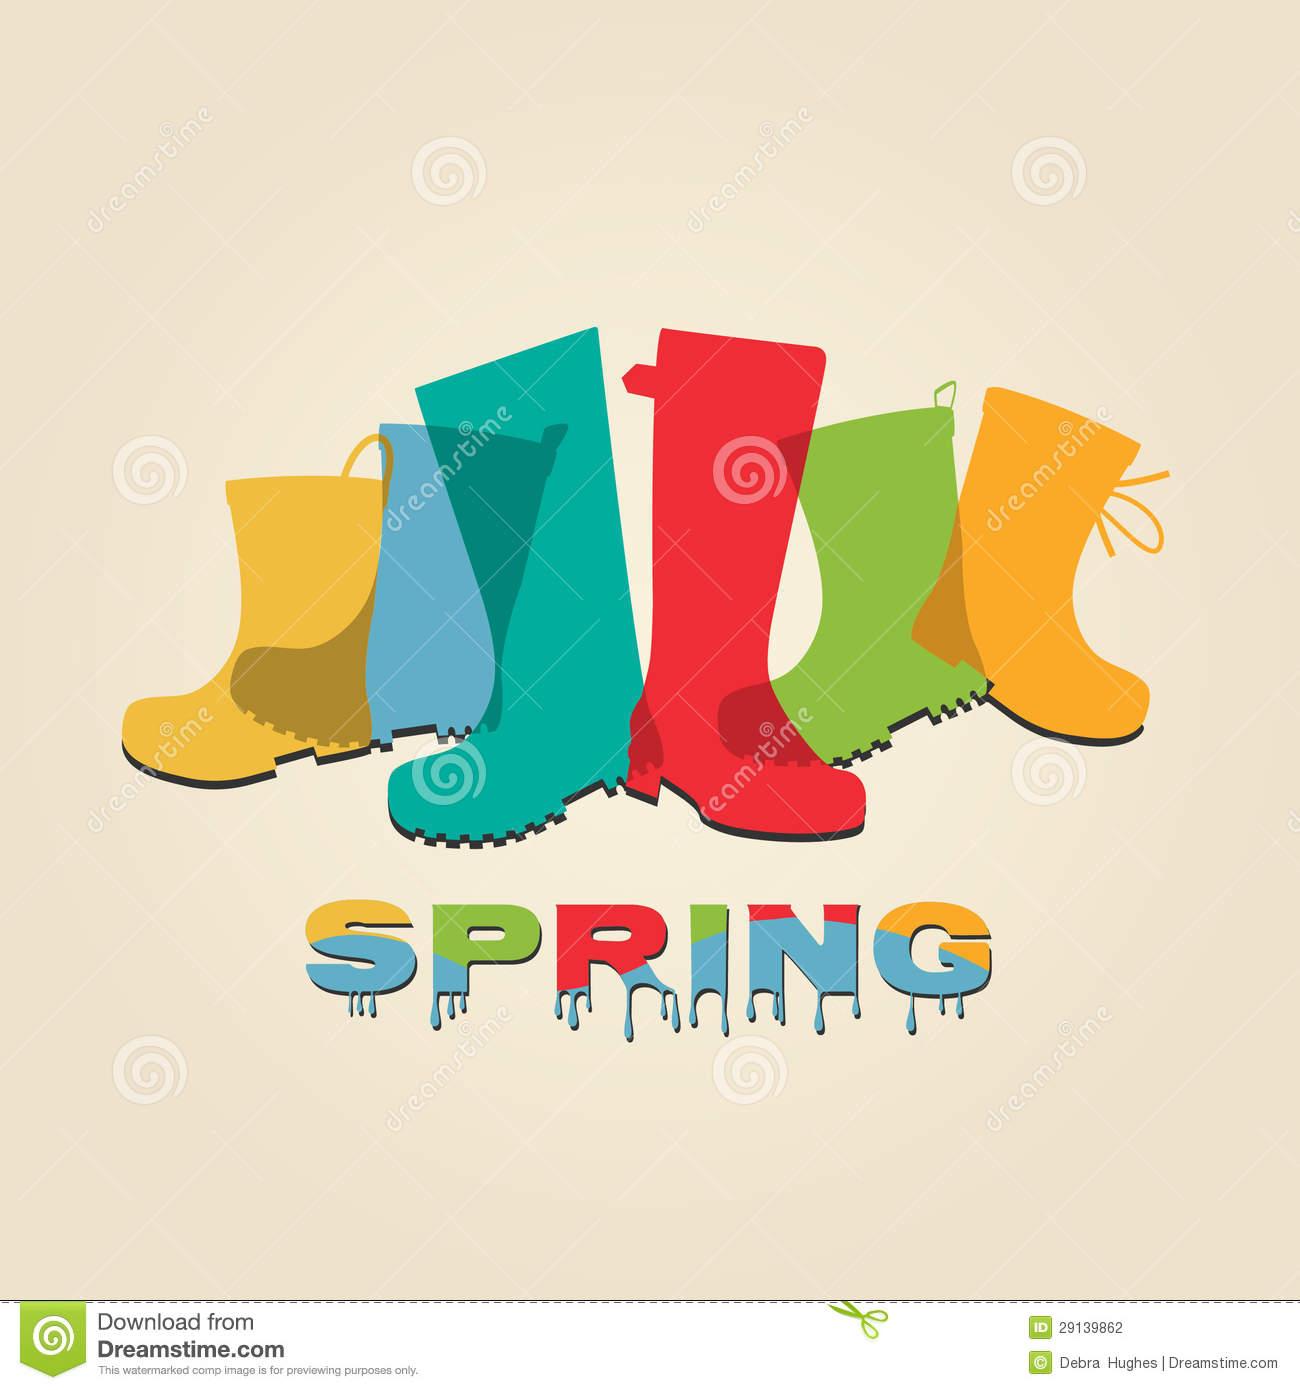 Spring Fashion Clipart.